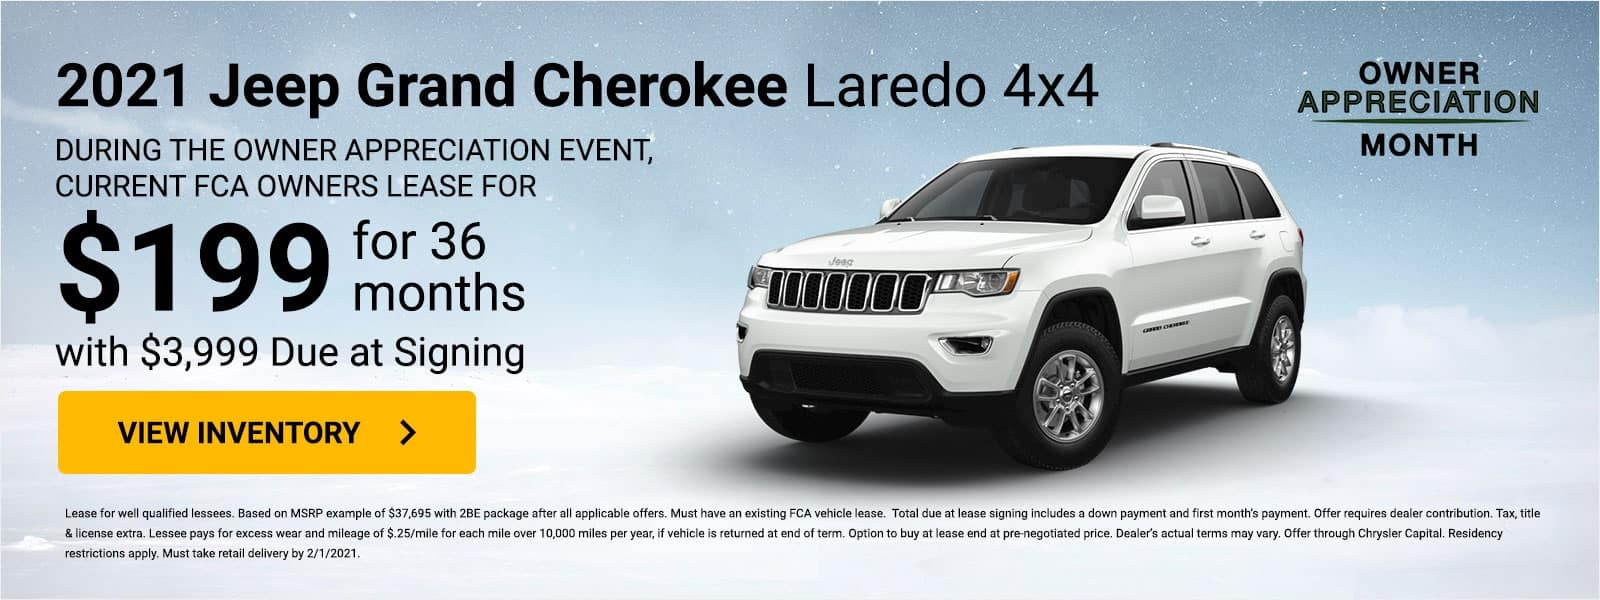 jeep-grand-cherokee-laredo-4×4-LEASE (PA,NJ,DE ONLY) (1)